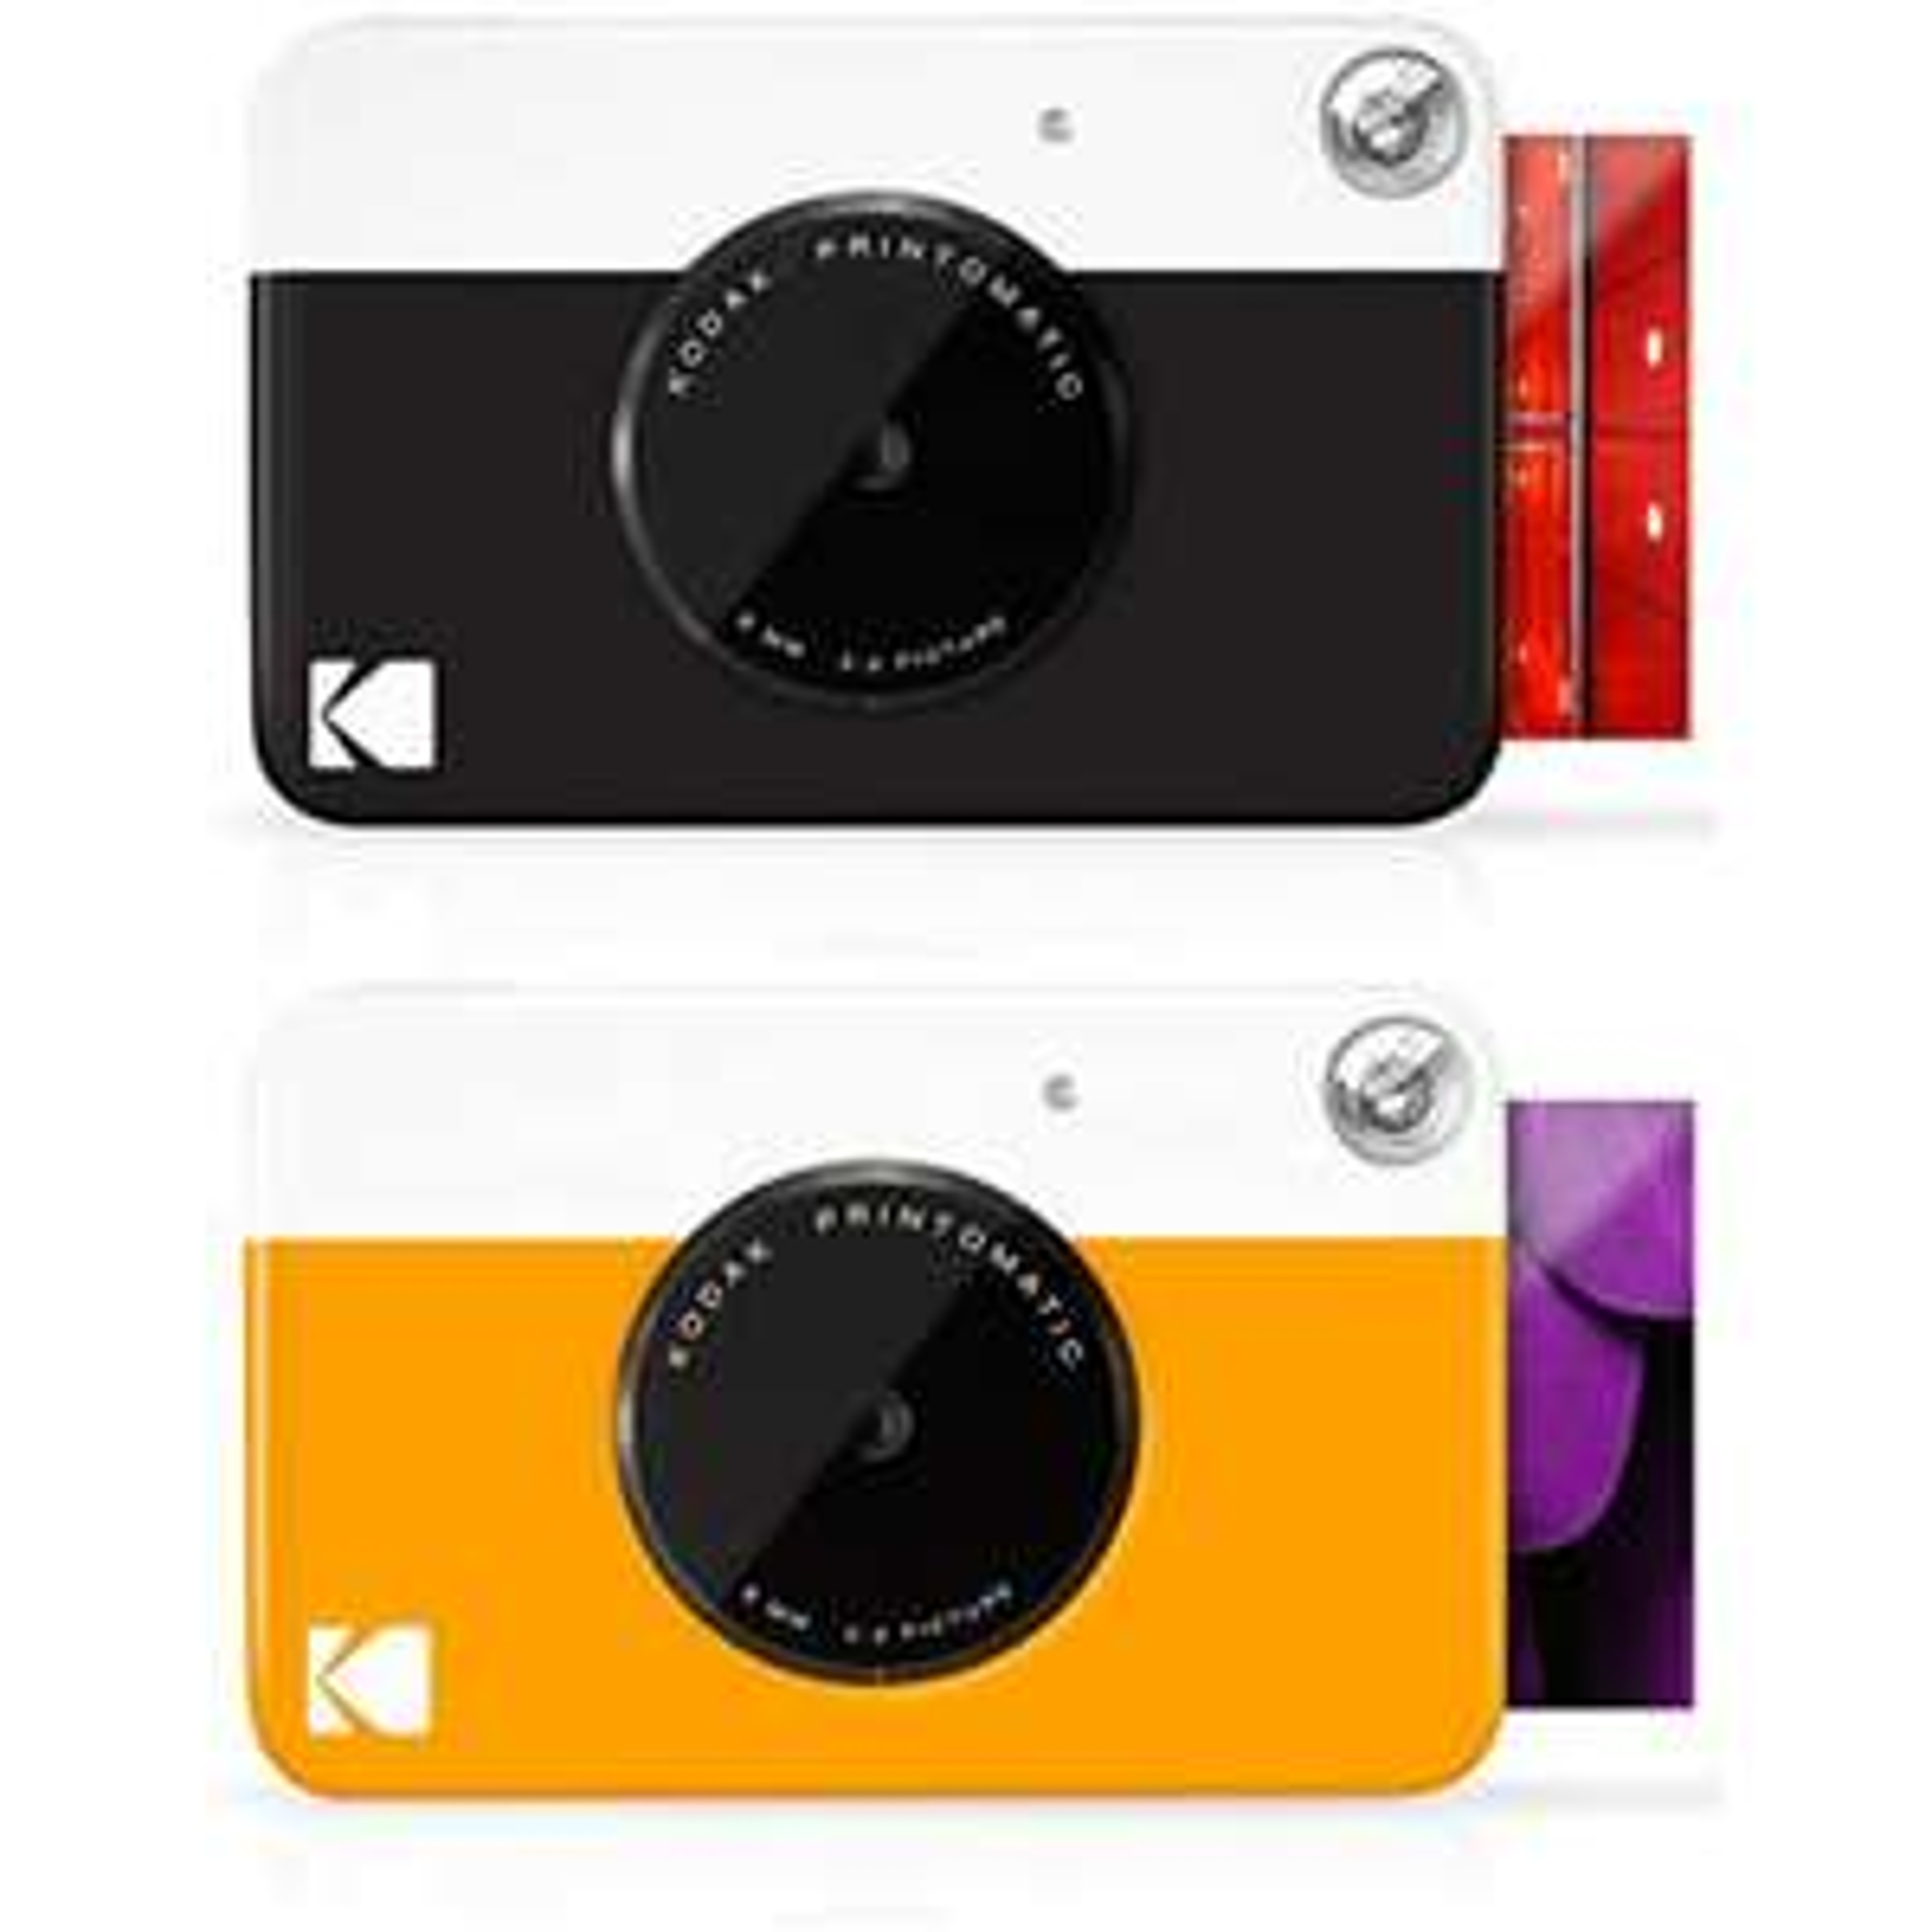 KODAK Printomatic Fotocamera istantanea Zink Zero Ink 2x3 con retro autoadesivo